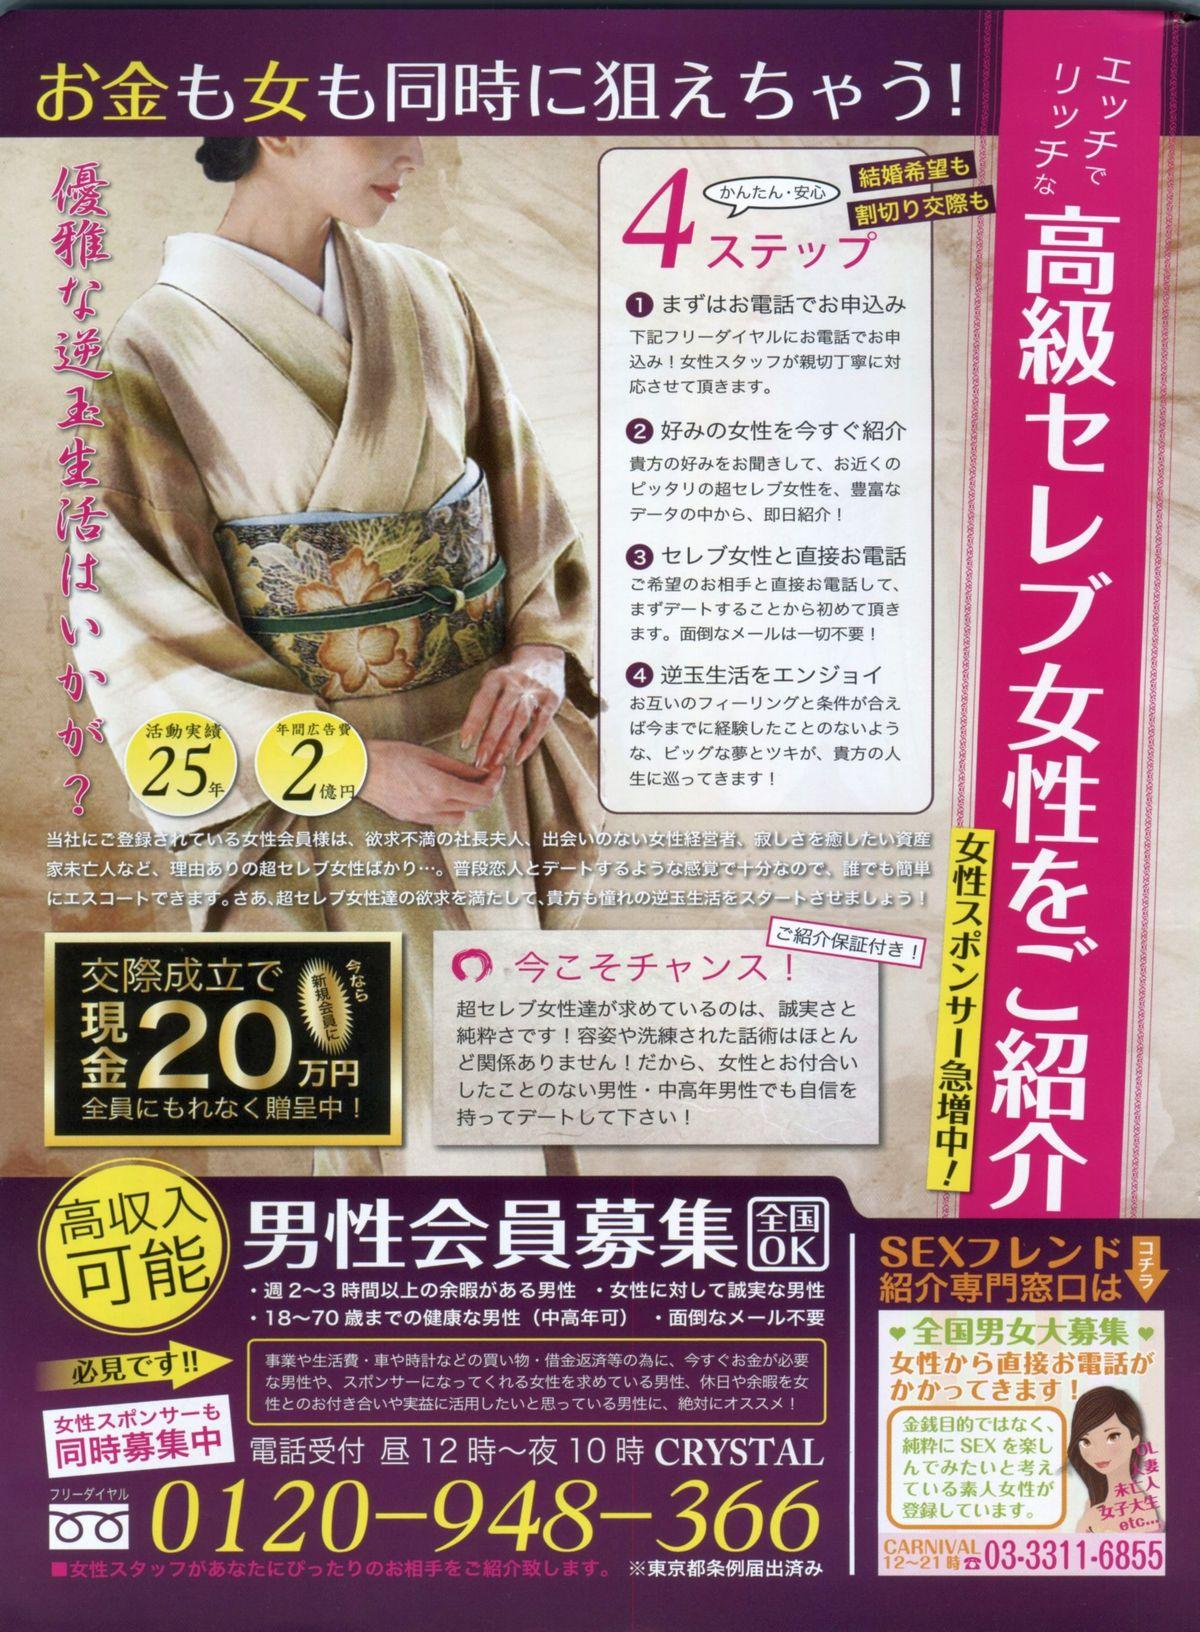 Manga Bon 2013-02 182